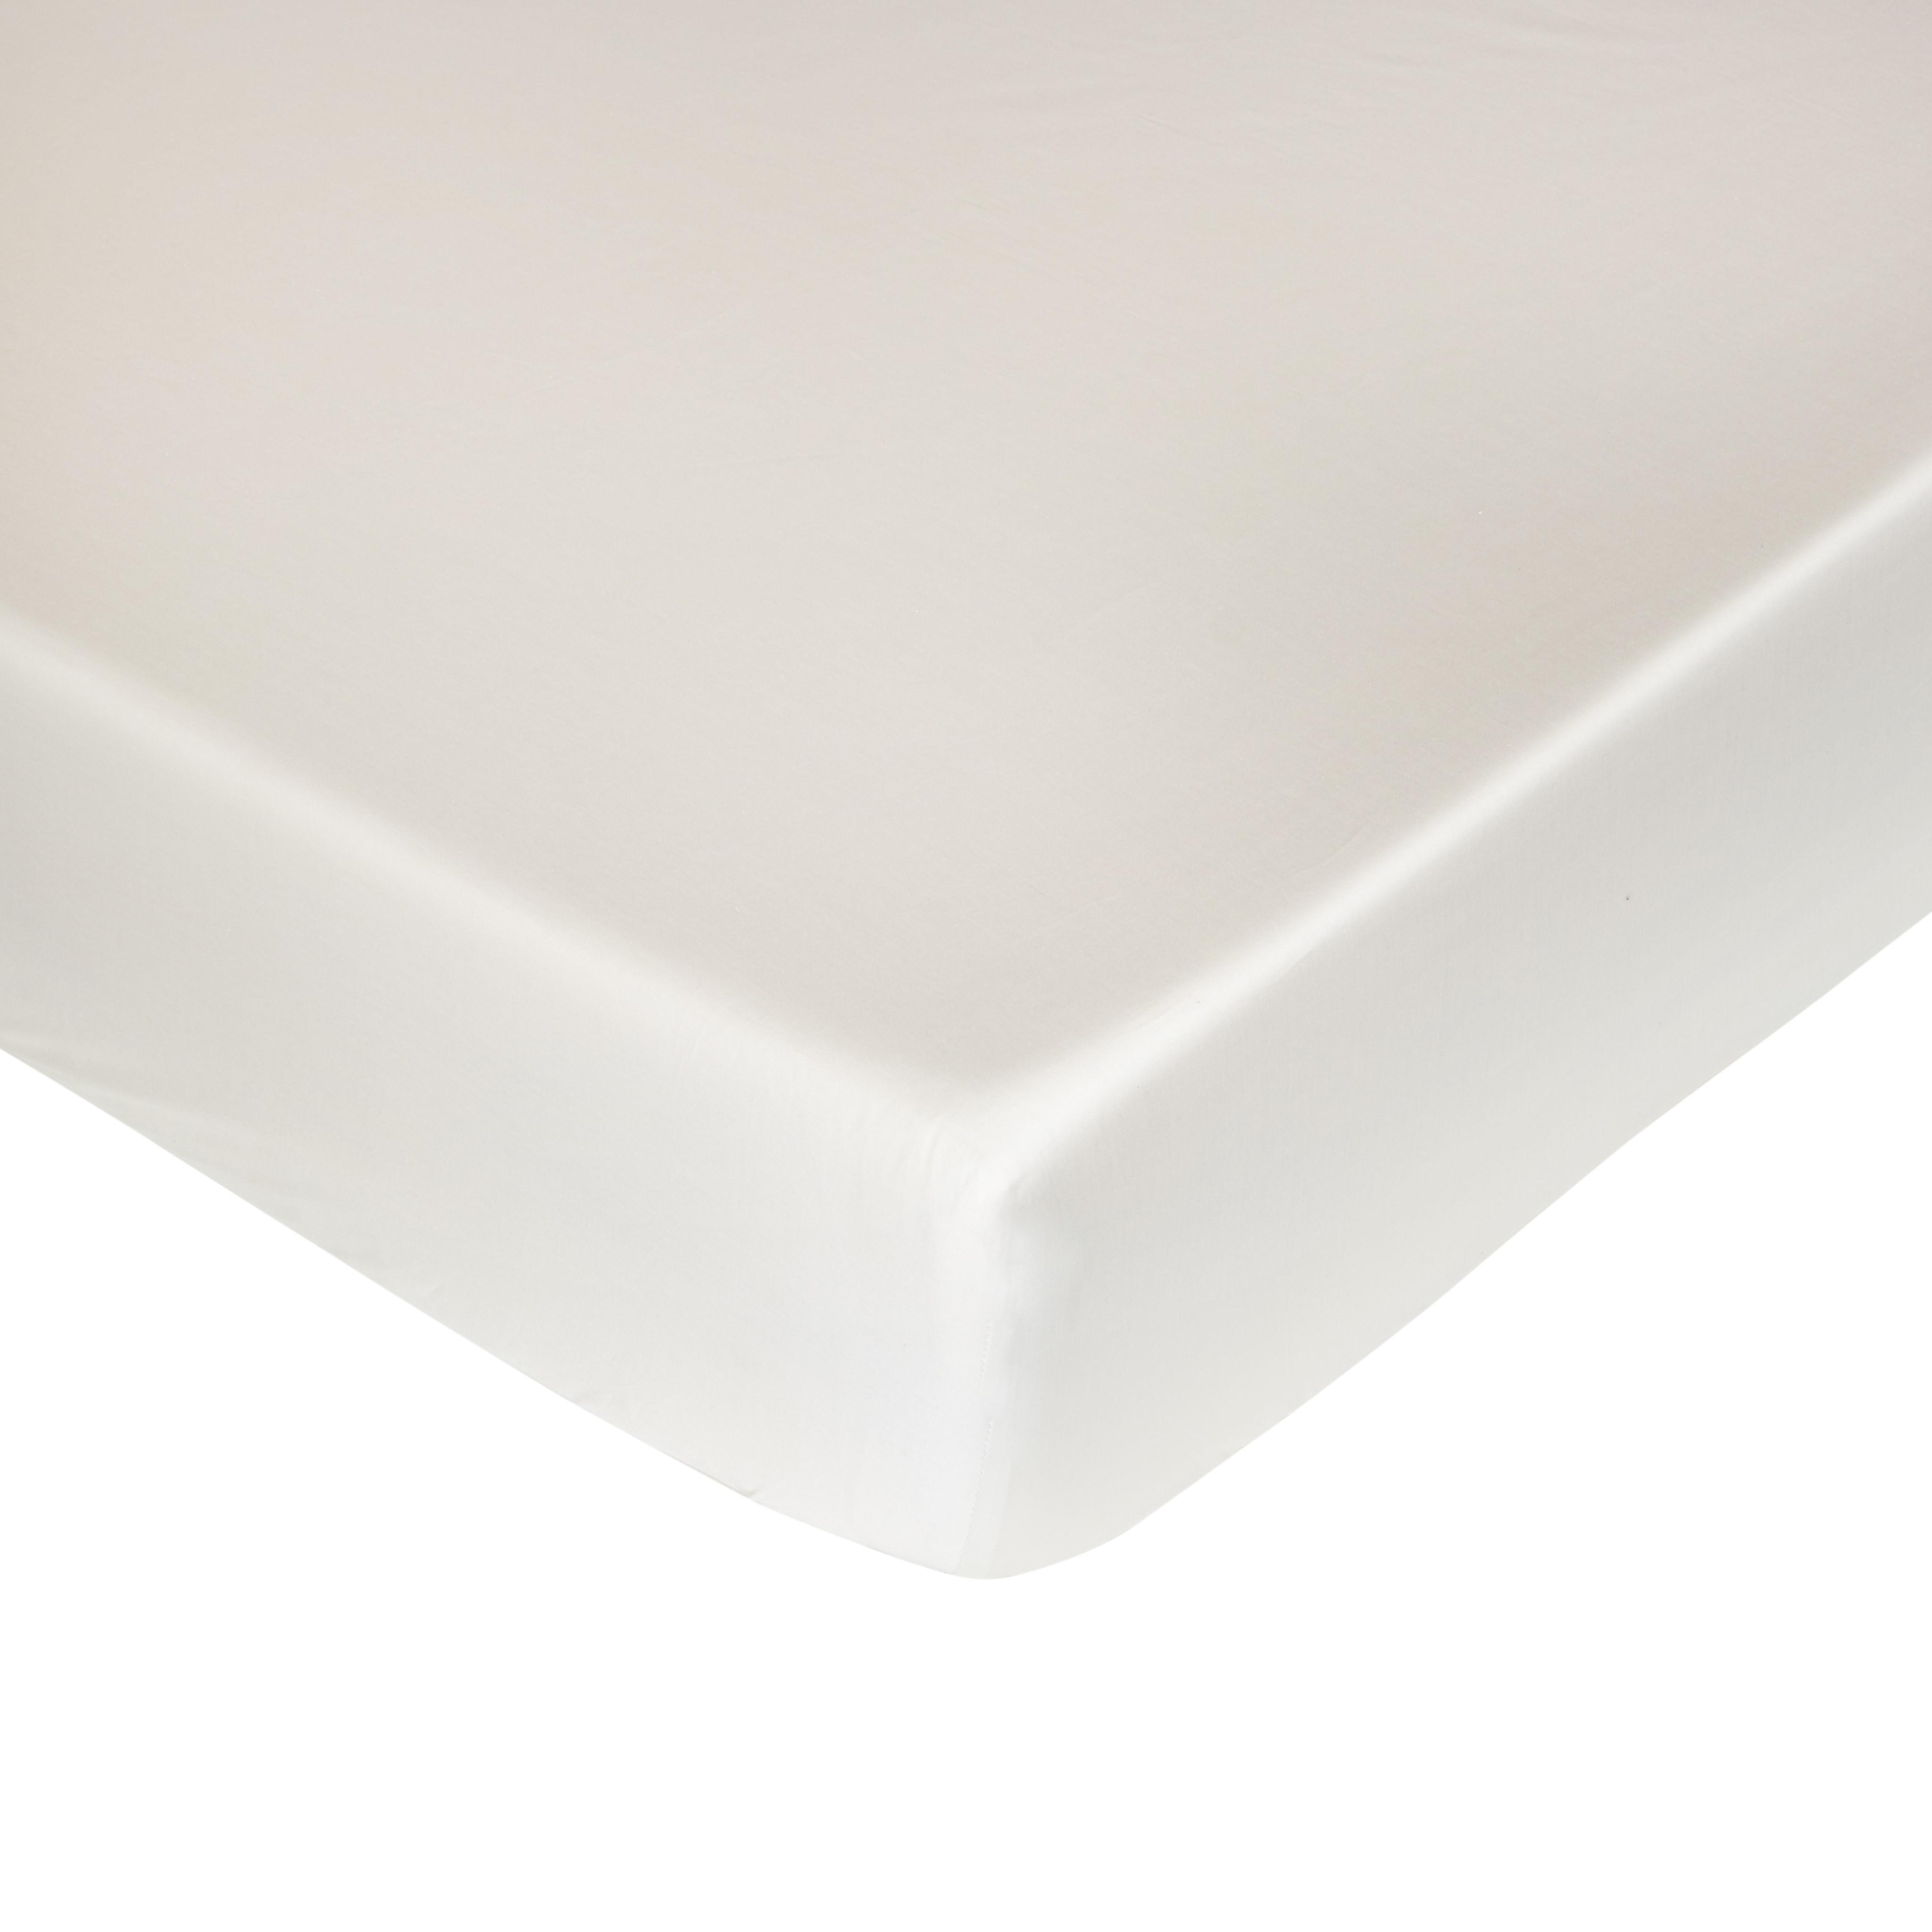 Lenzuolo angoli raso alta qualità Interno 11, Crema, large image number 0